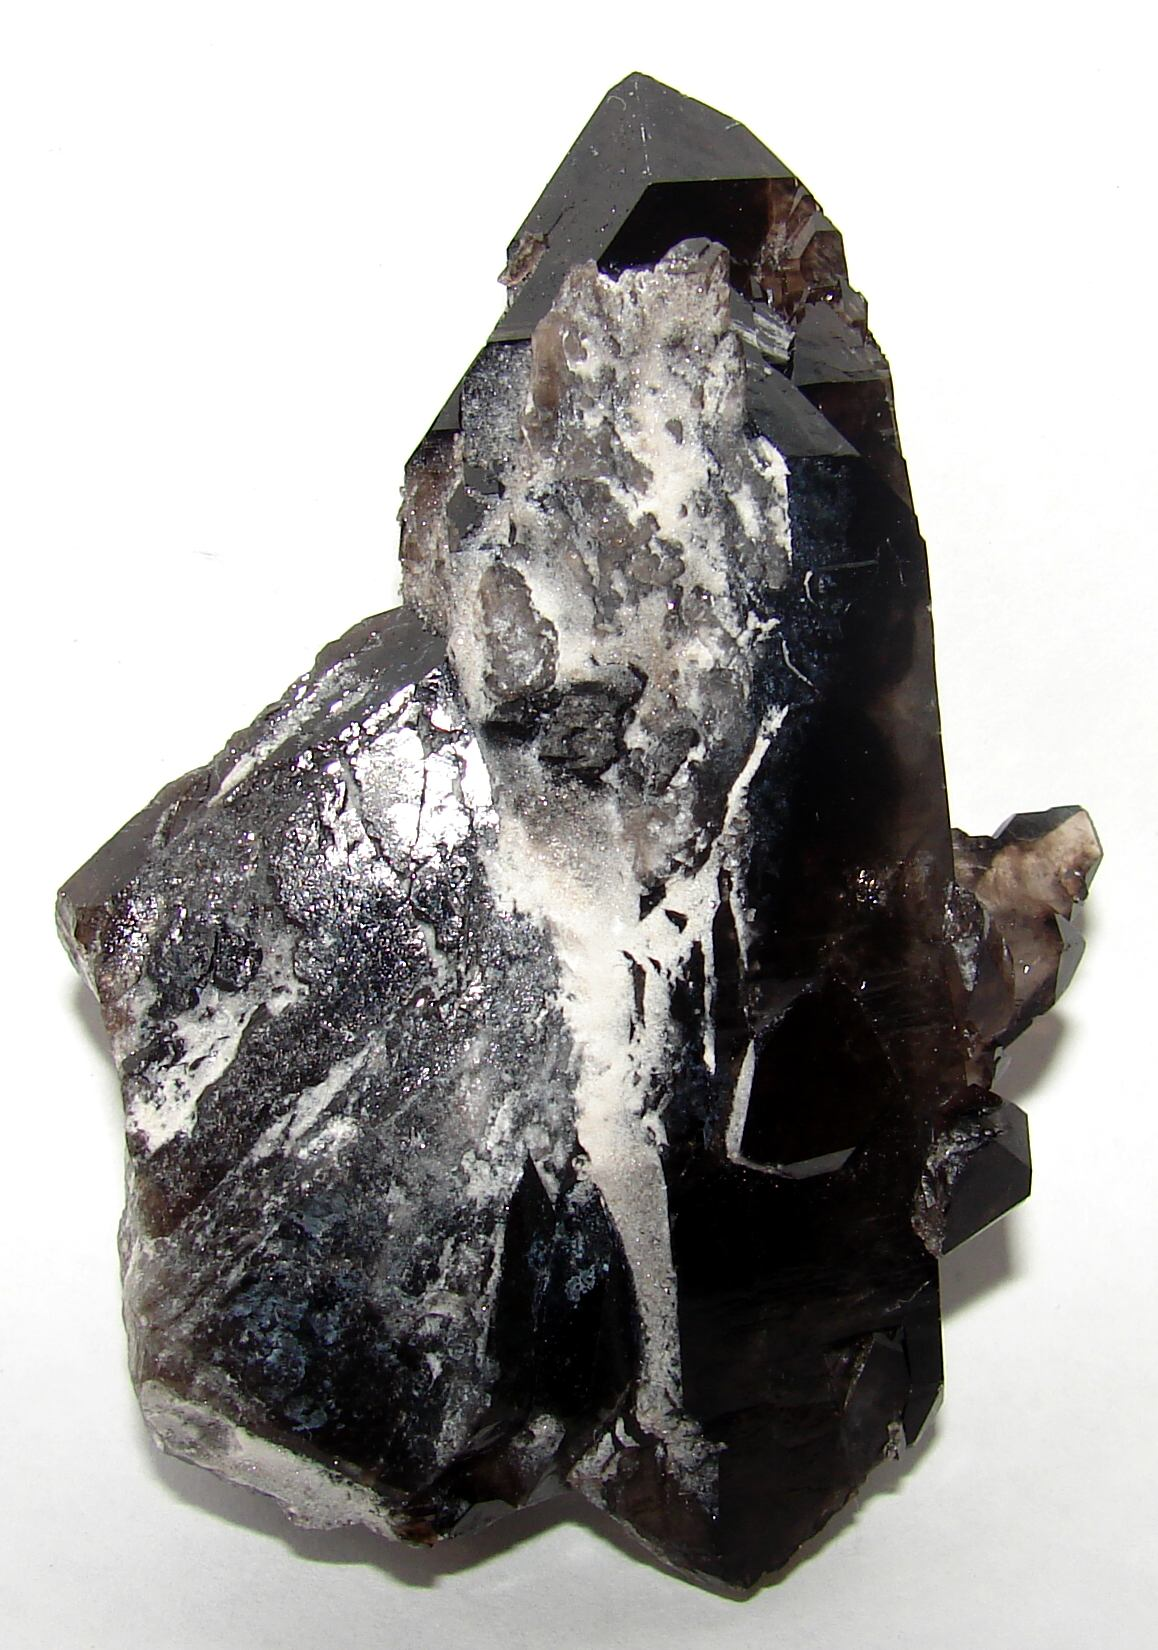 http://www.quartzcrystals.net/smsmokey-1.jpg (582341 bytes)